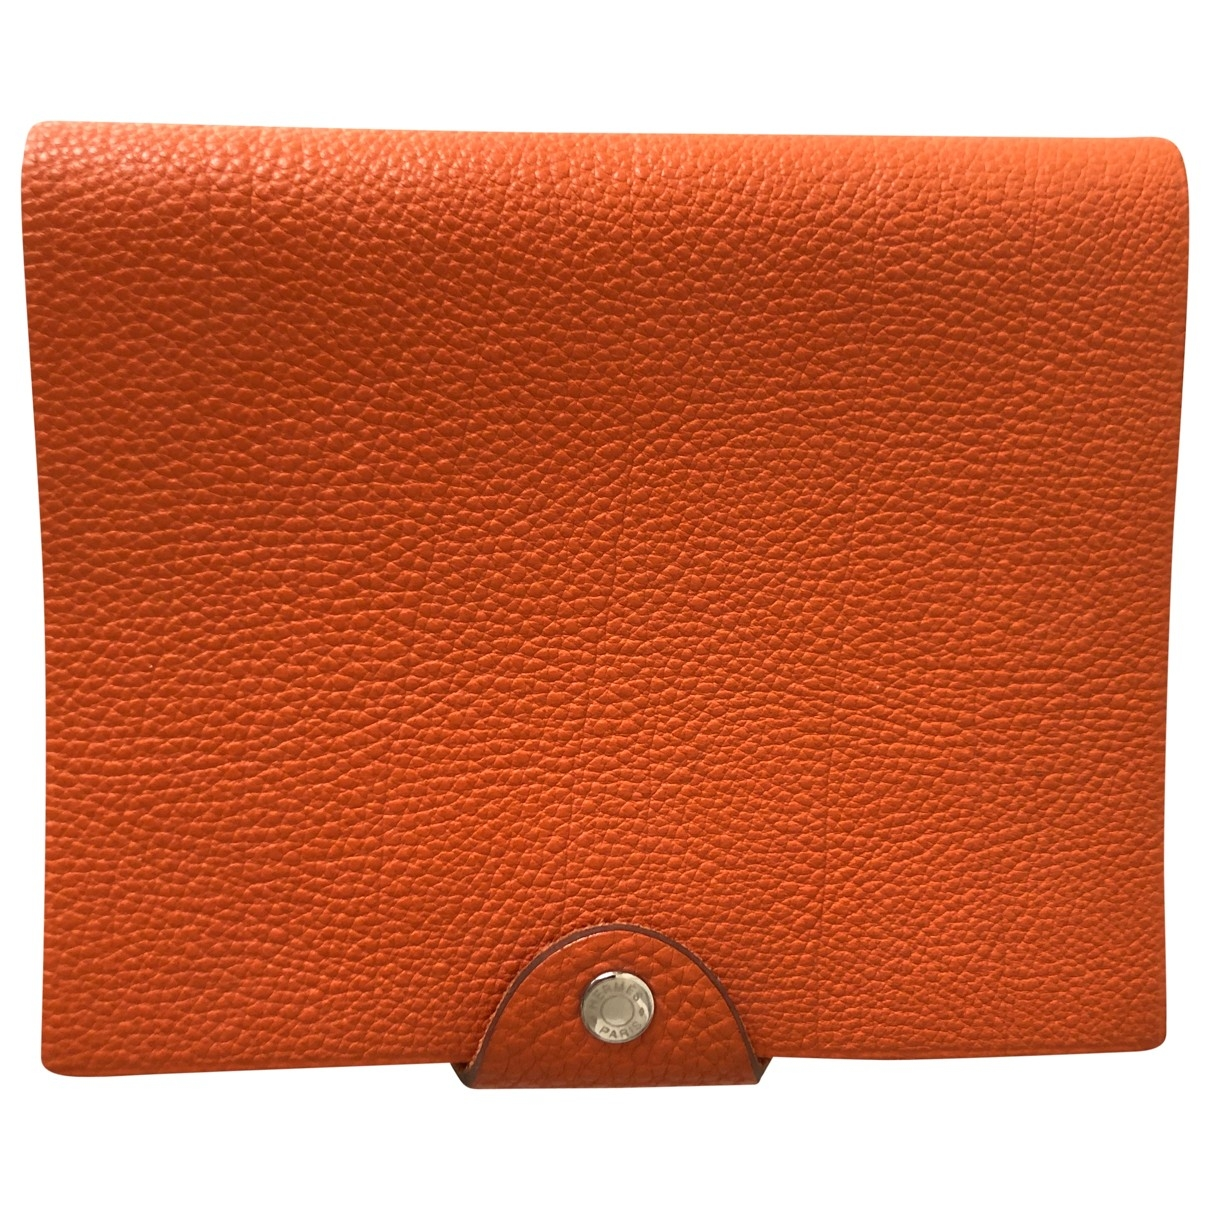 Hermes - Objets & Deco Ulysse PM pour lifestyle en cuir - orange